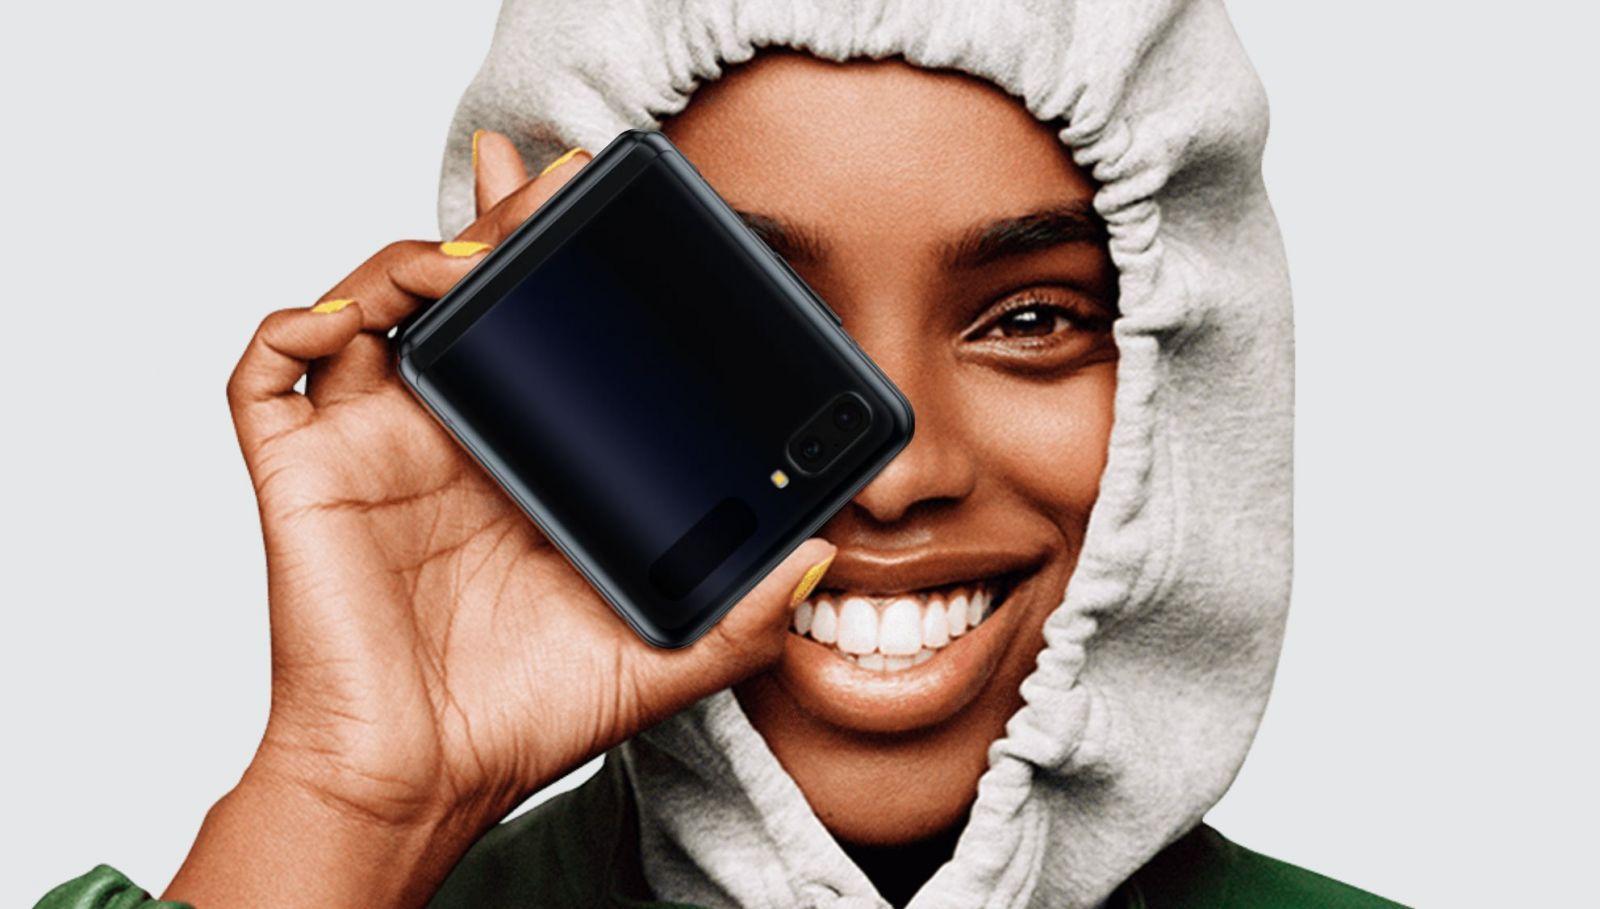 Samsung Galaxy Z Flip с поддержкой 5G выйдет во второй половине 2020 года (heres android auto on samsungs most innovative smartphone yet 141970 1)